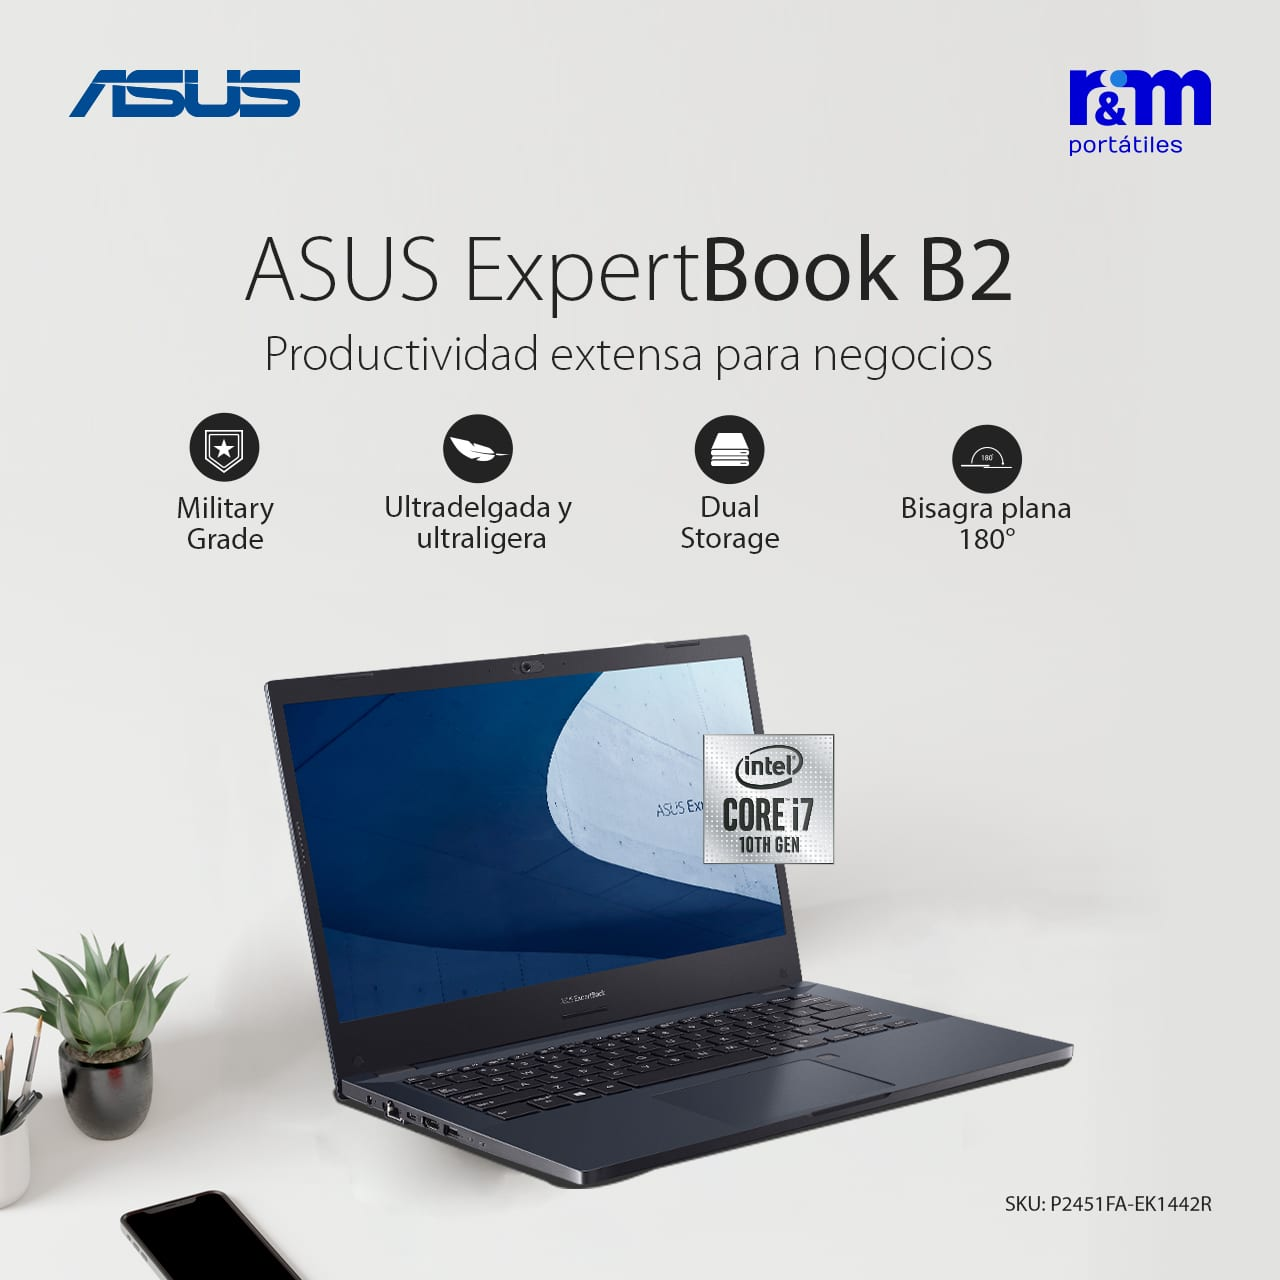 Home - Banner Facebook P245 i7 RYM portatiles - R&M Portátiles